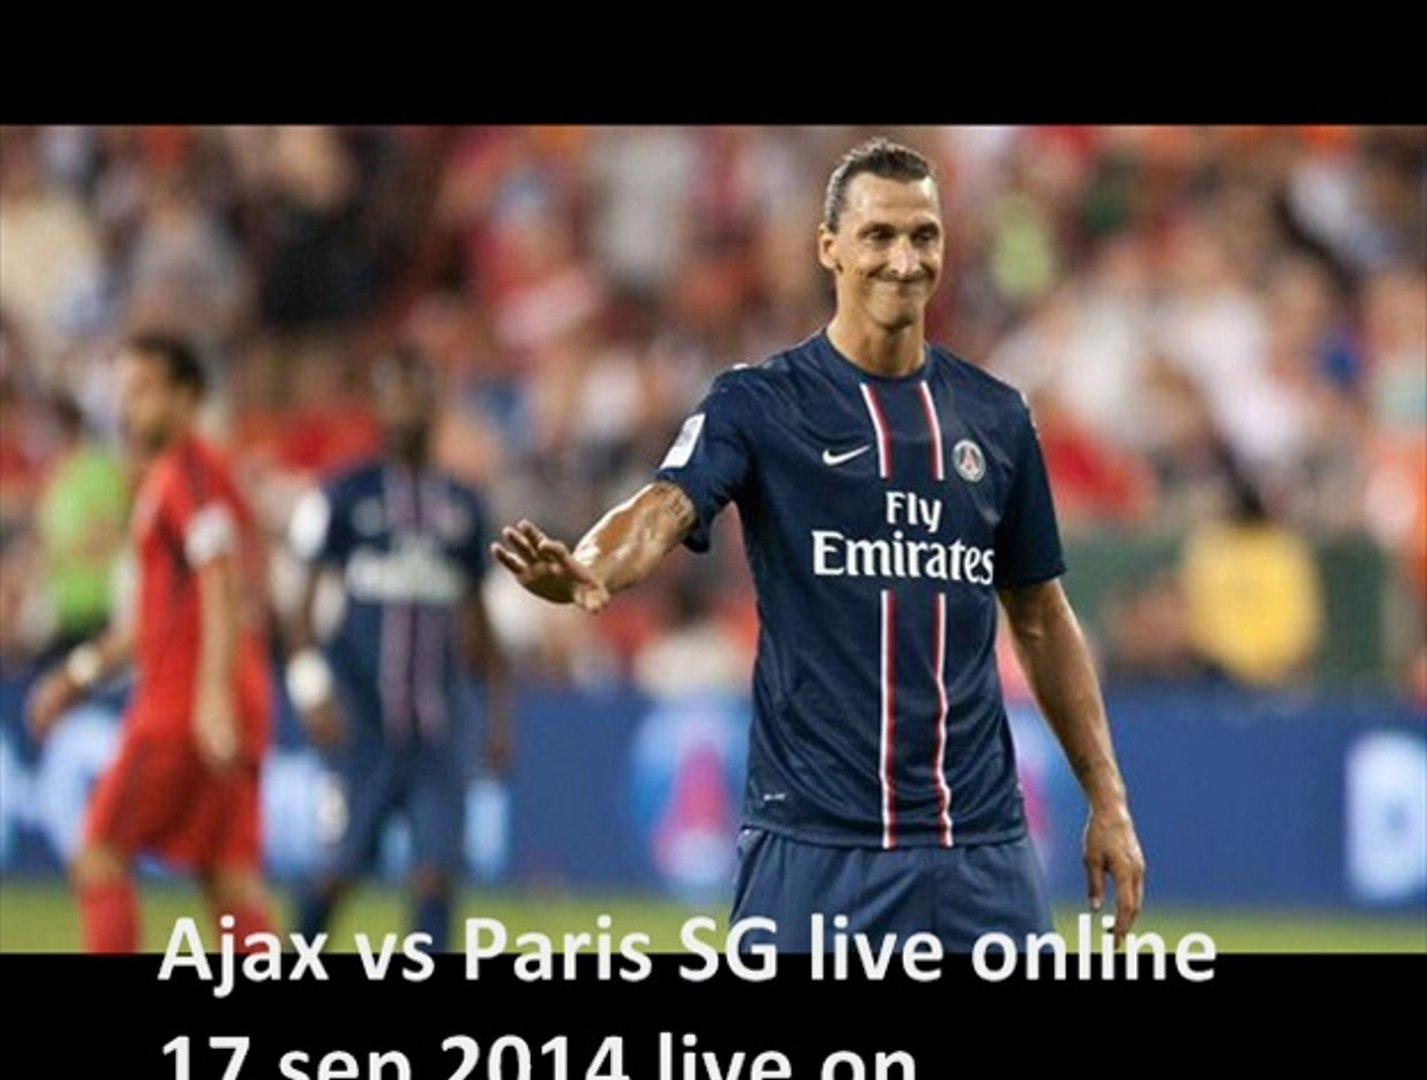 stream uefa cl 2014 games Ajax vs Paris SG